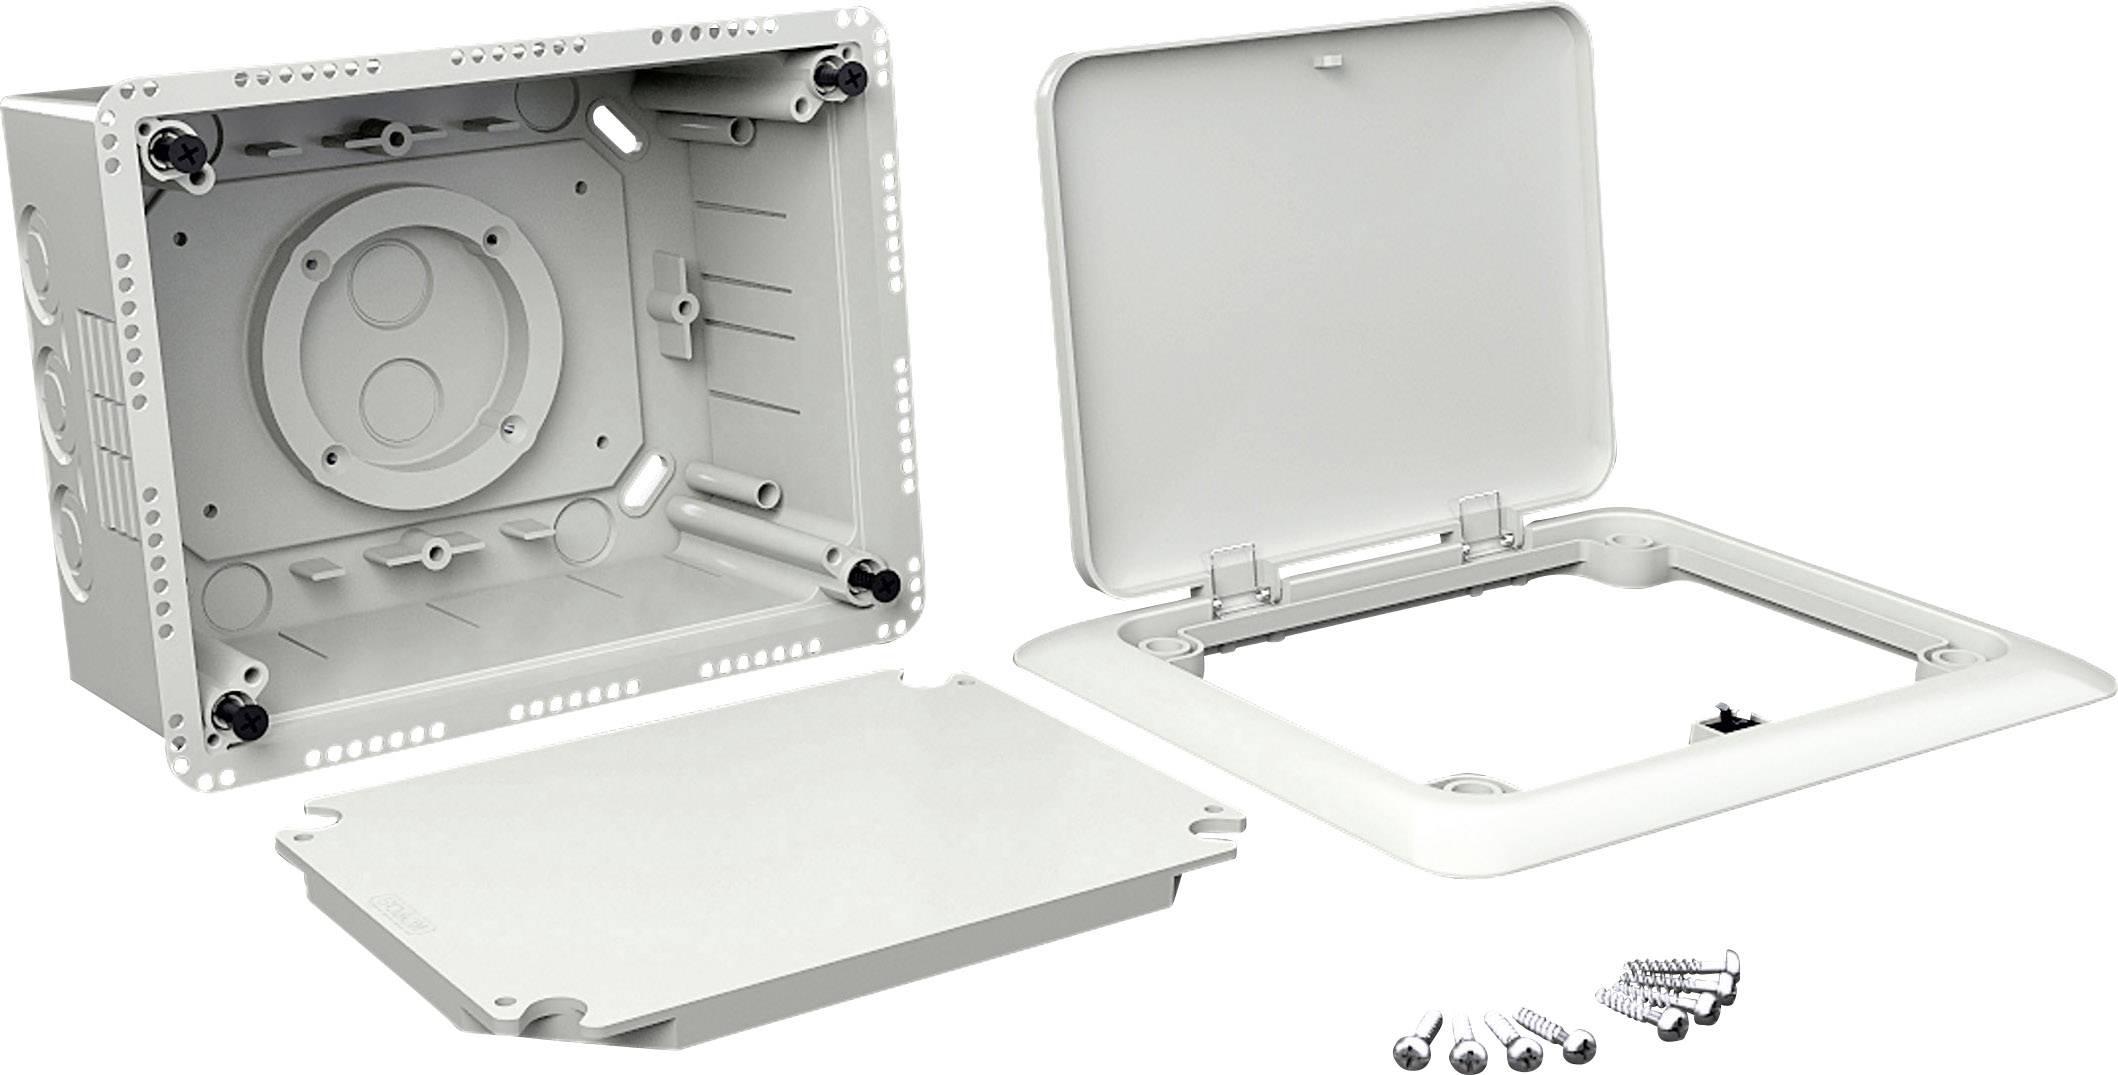 Kopos 10x 2-Fach Ger/ätedose Hohlwanddose Unterputz Orange Elektro Dose Installation Hohlwand